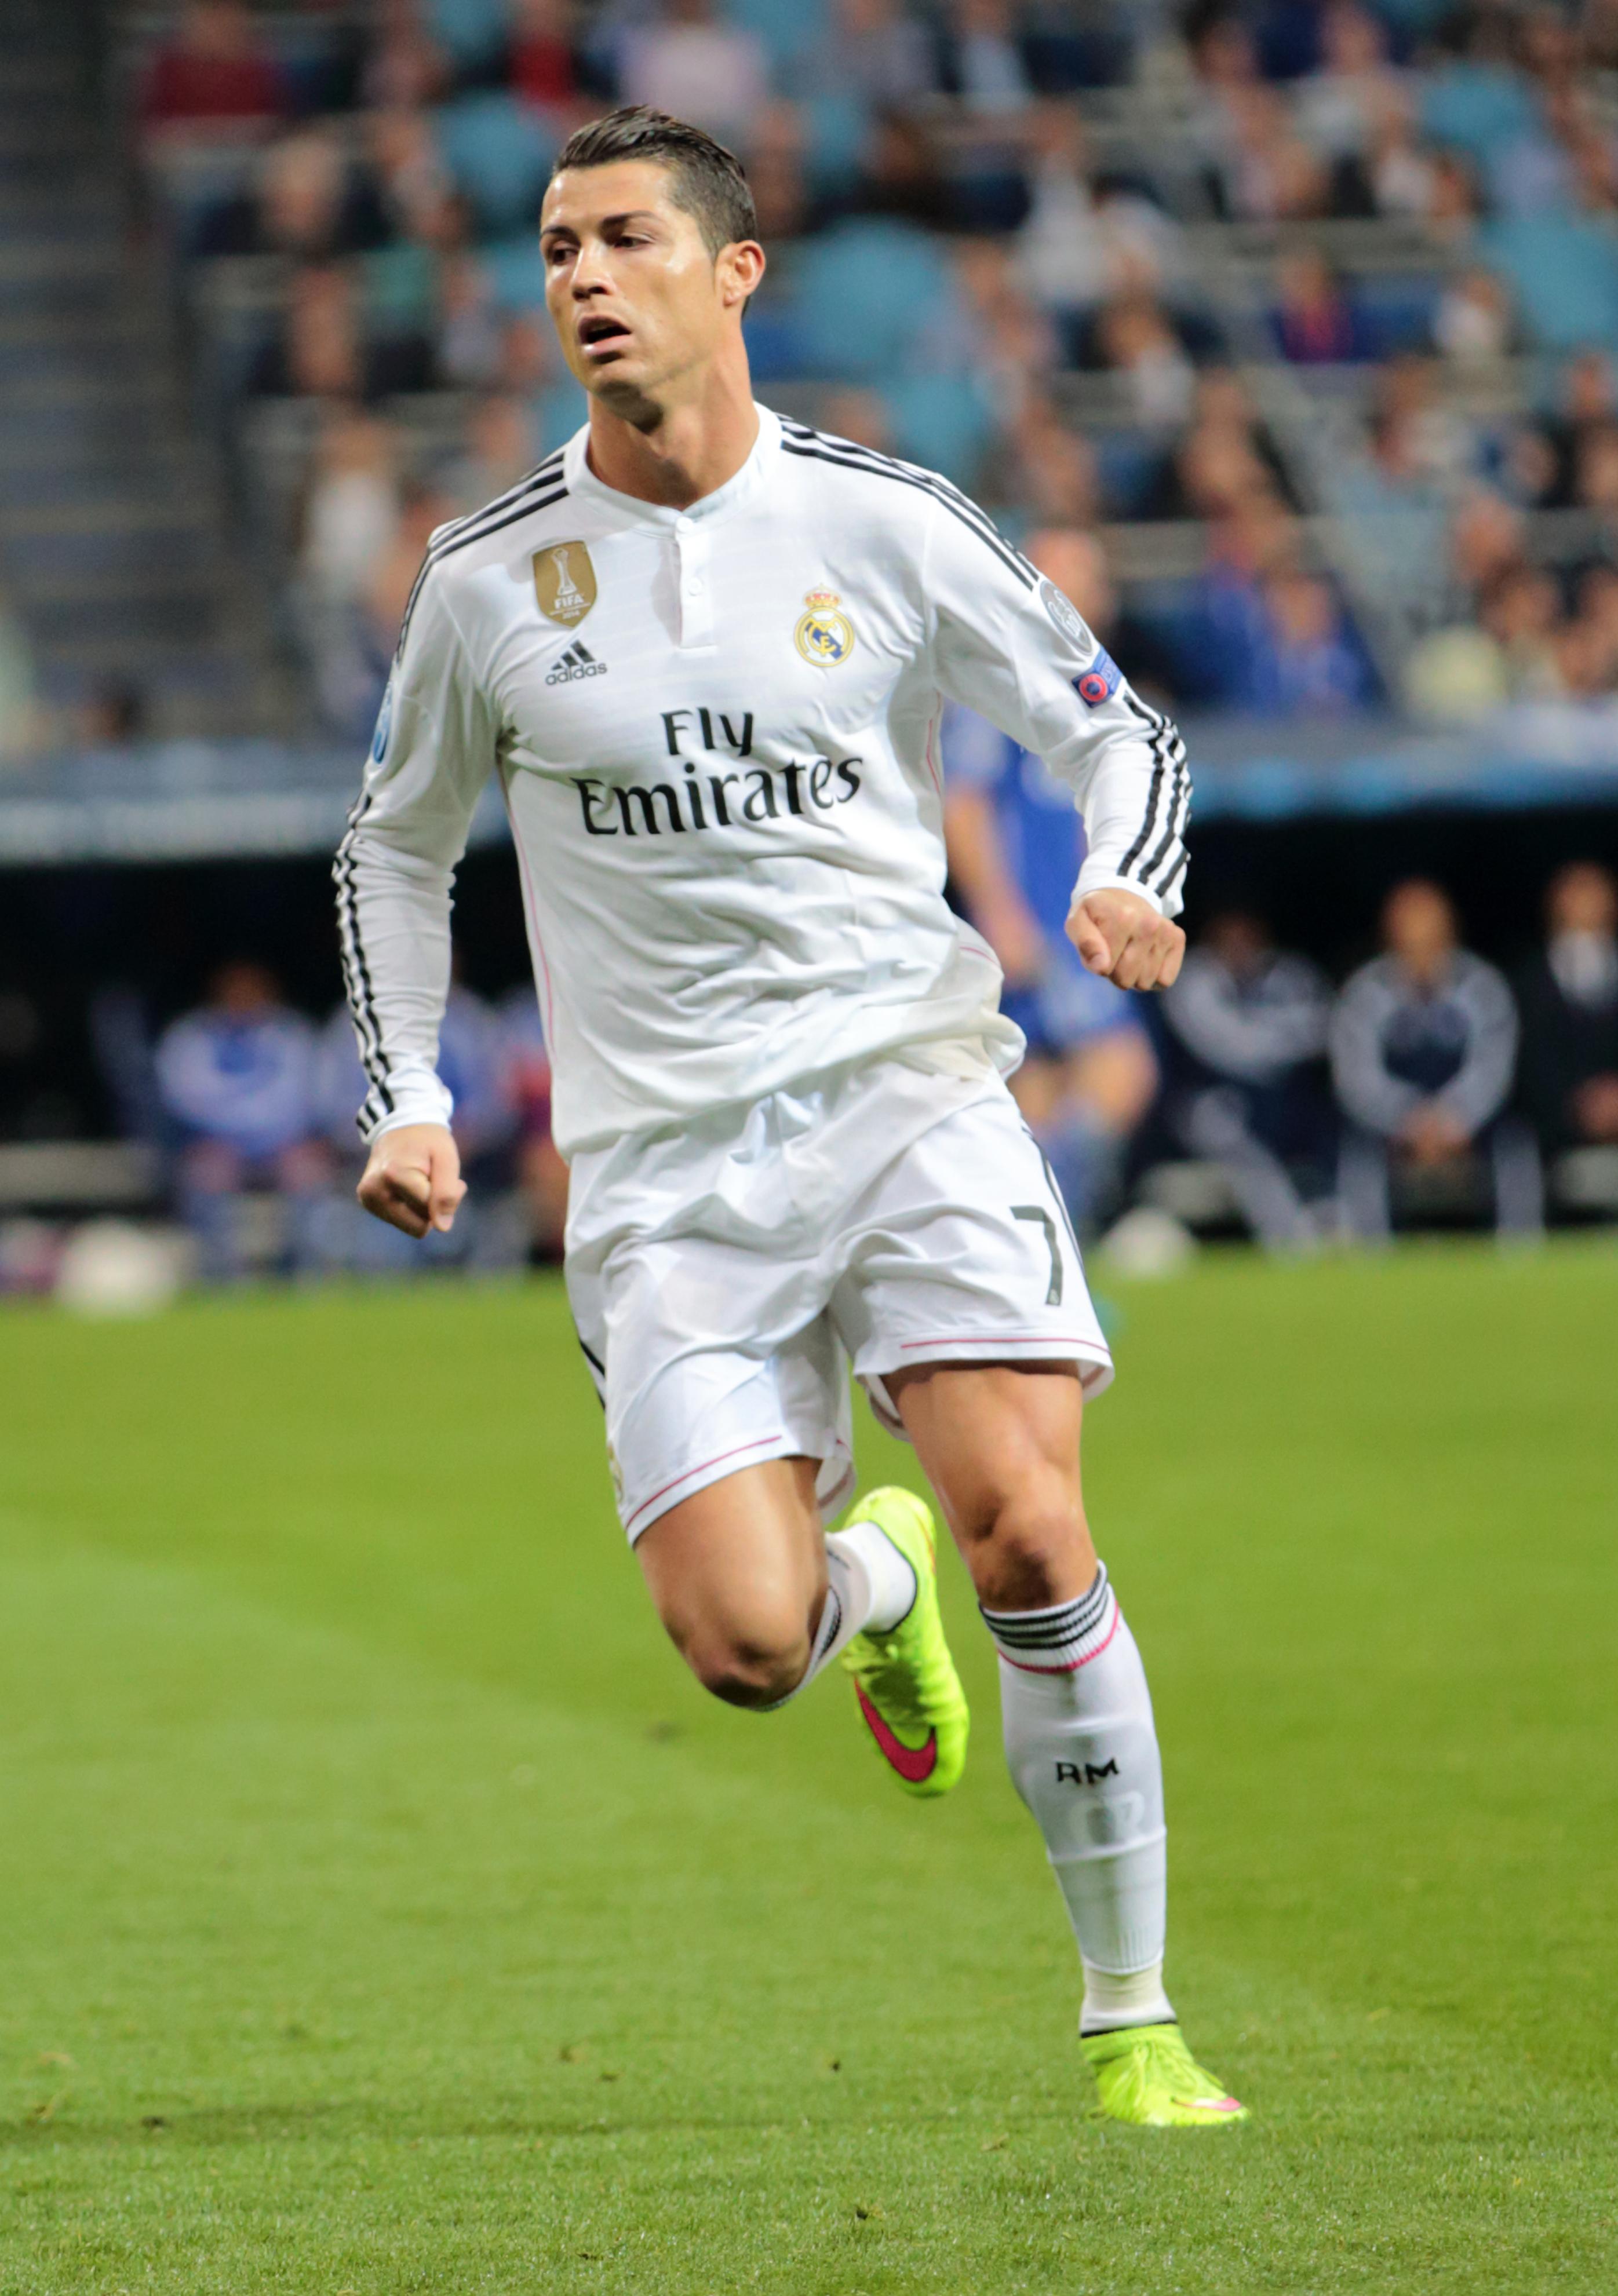 Ronaldo_vs__FC_Schalke_04_(16854146922)